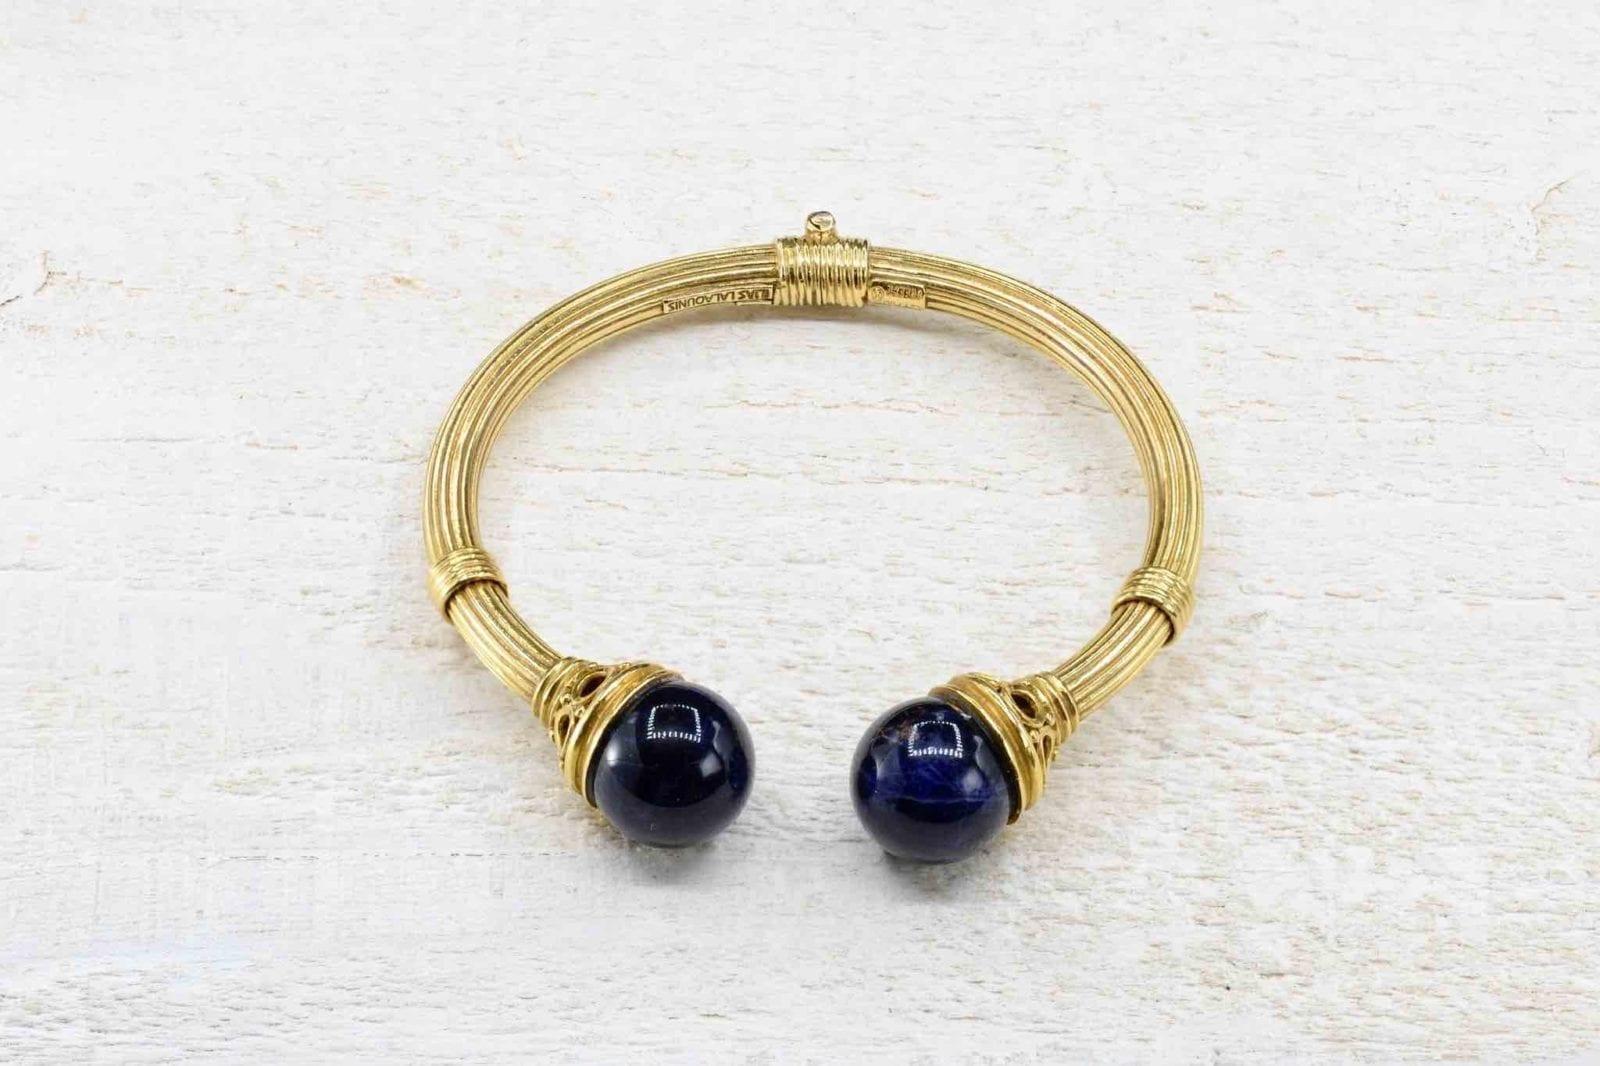 bracelet Lalaounis sodalite or 18k